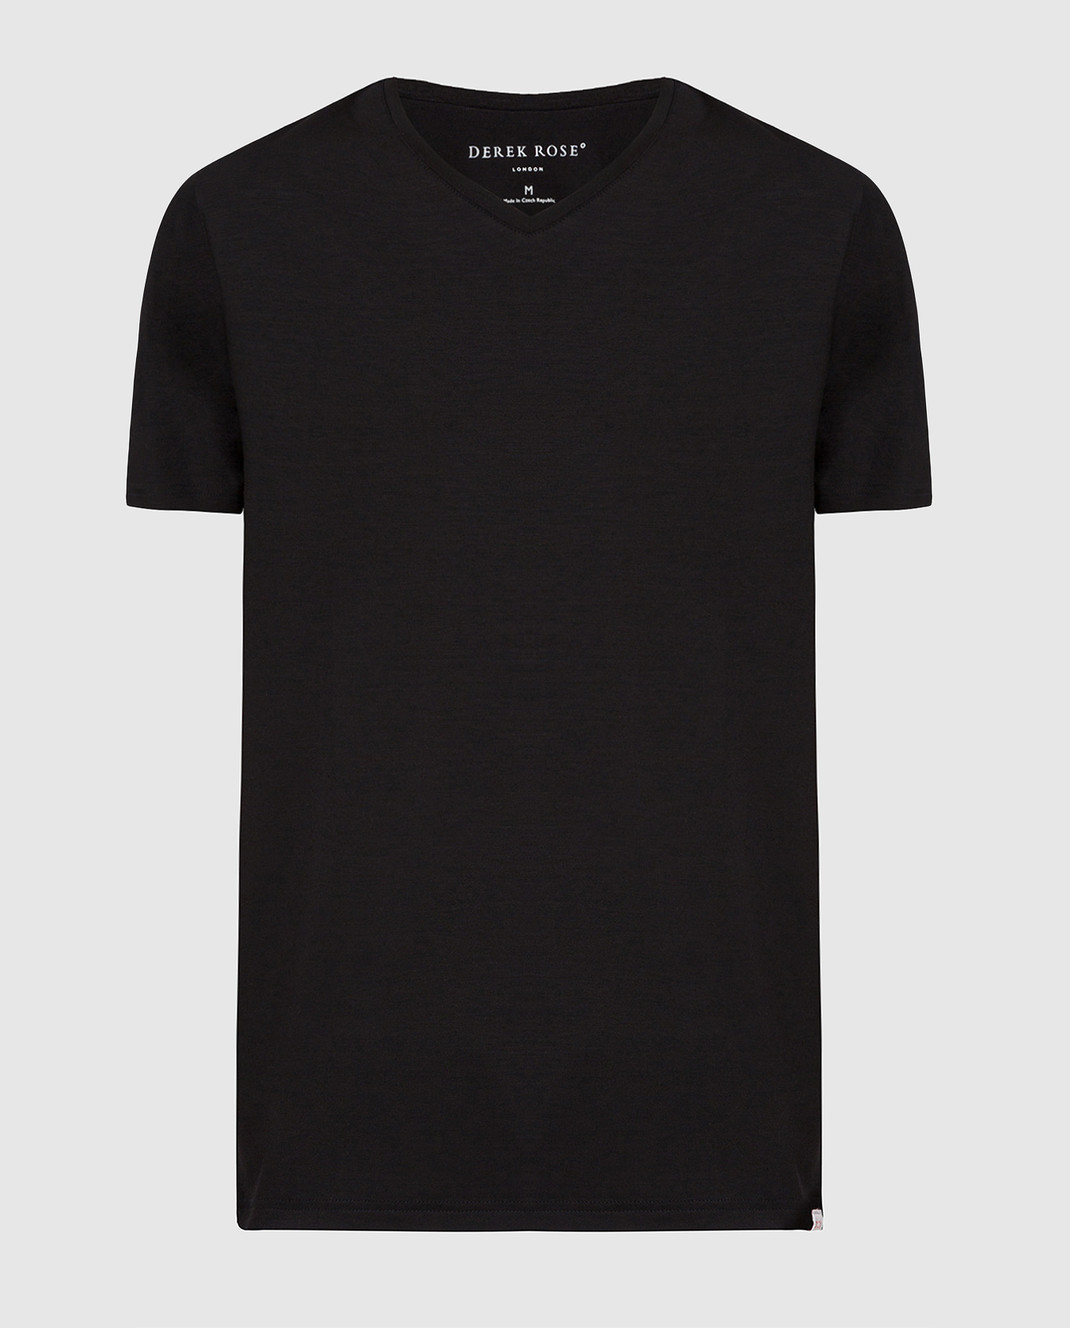 Derek Rose Черная футболка 3083BASE001